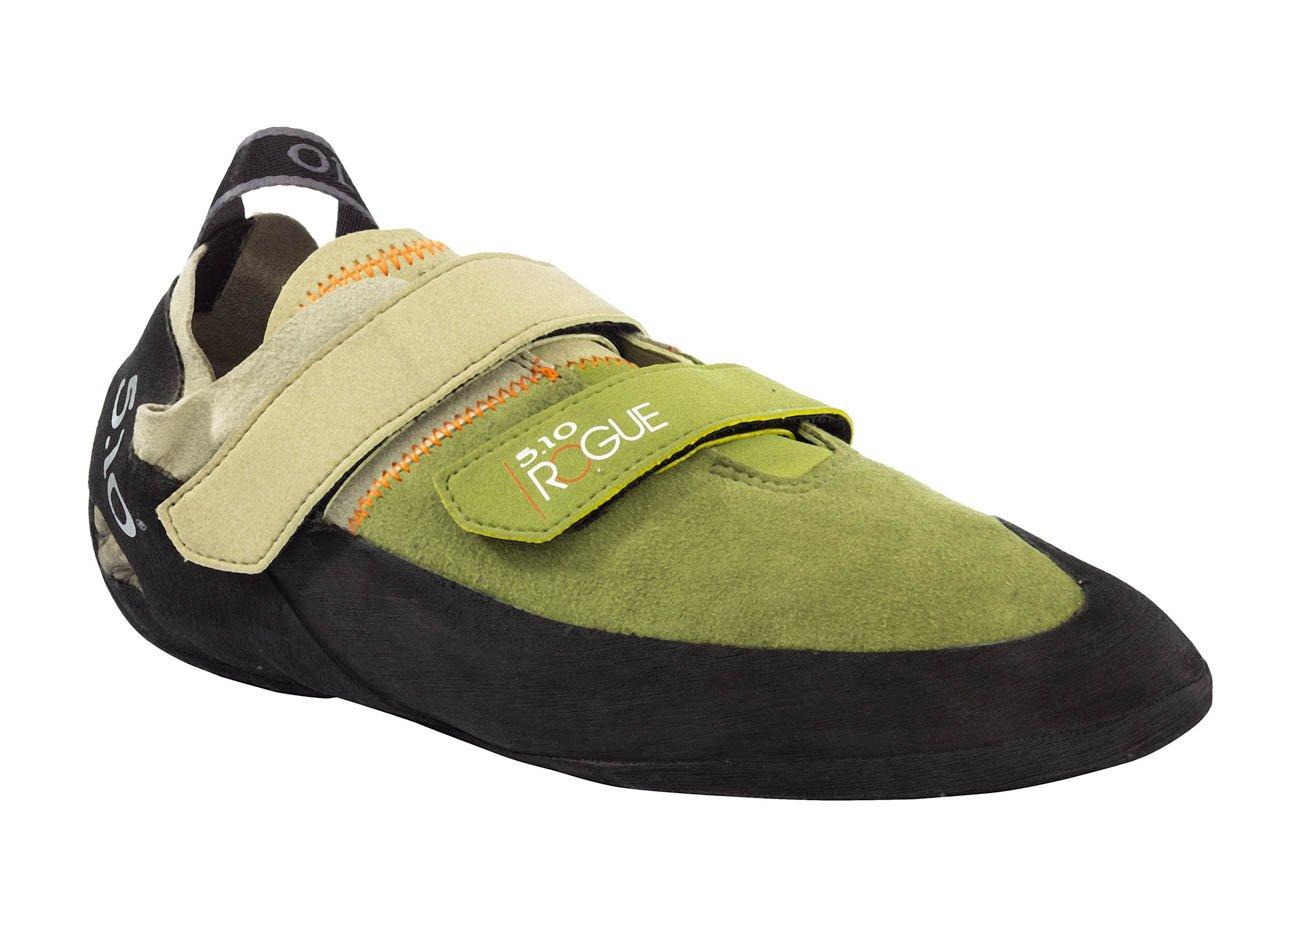 Five Ten Men's Rogue VCS Synthetic Neutral Climbing Shoes, Olive, 12.5